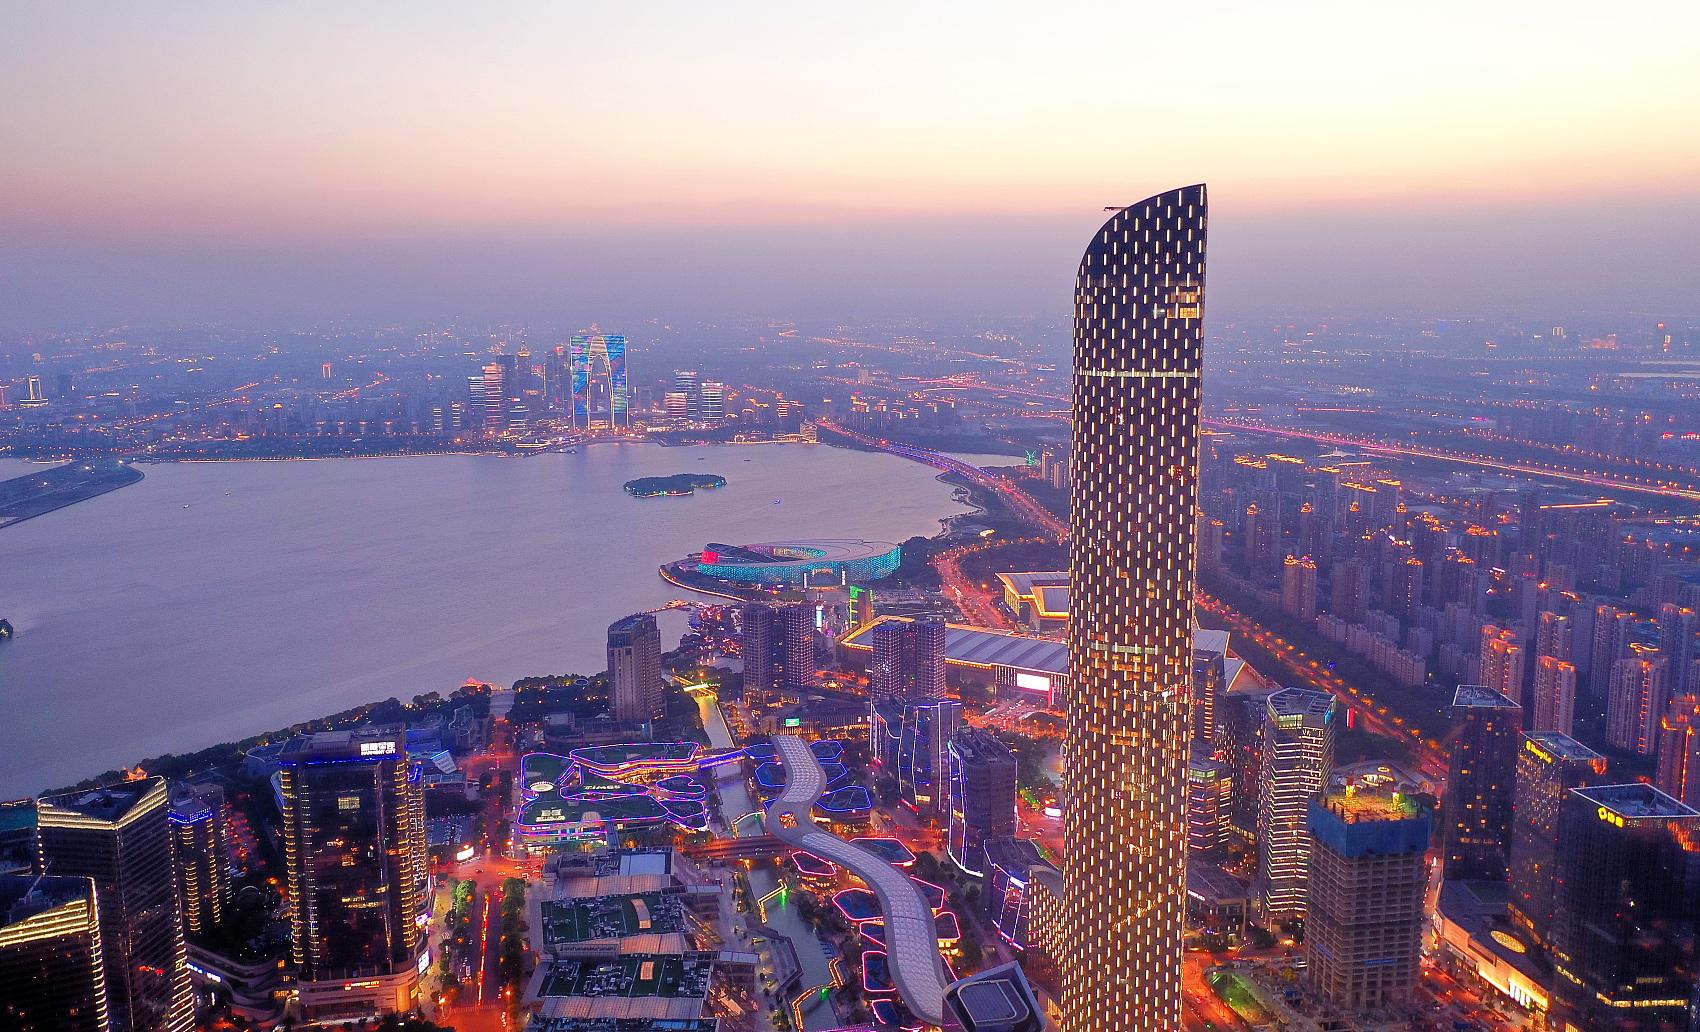 China still attractive to foreign investment despite COVID-19: AmCham Shanghai president